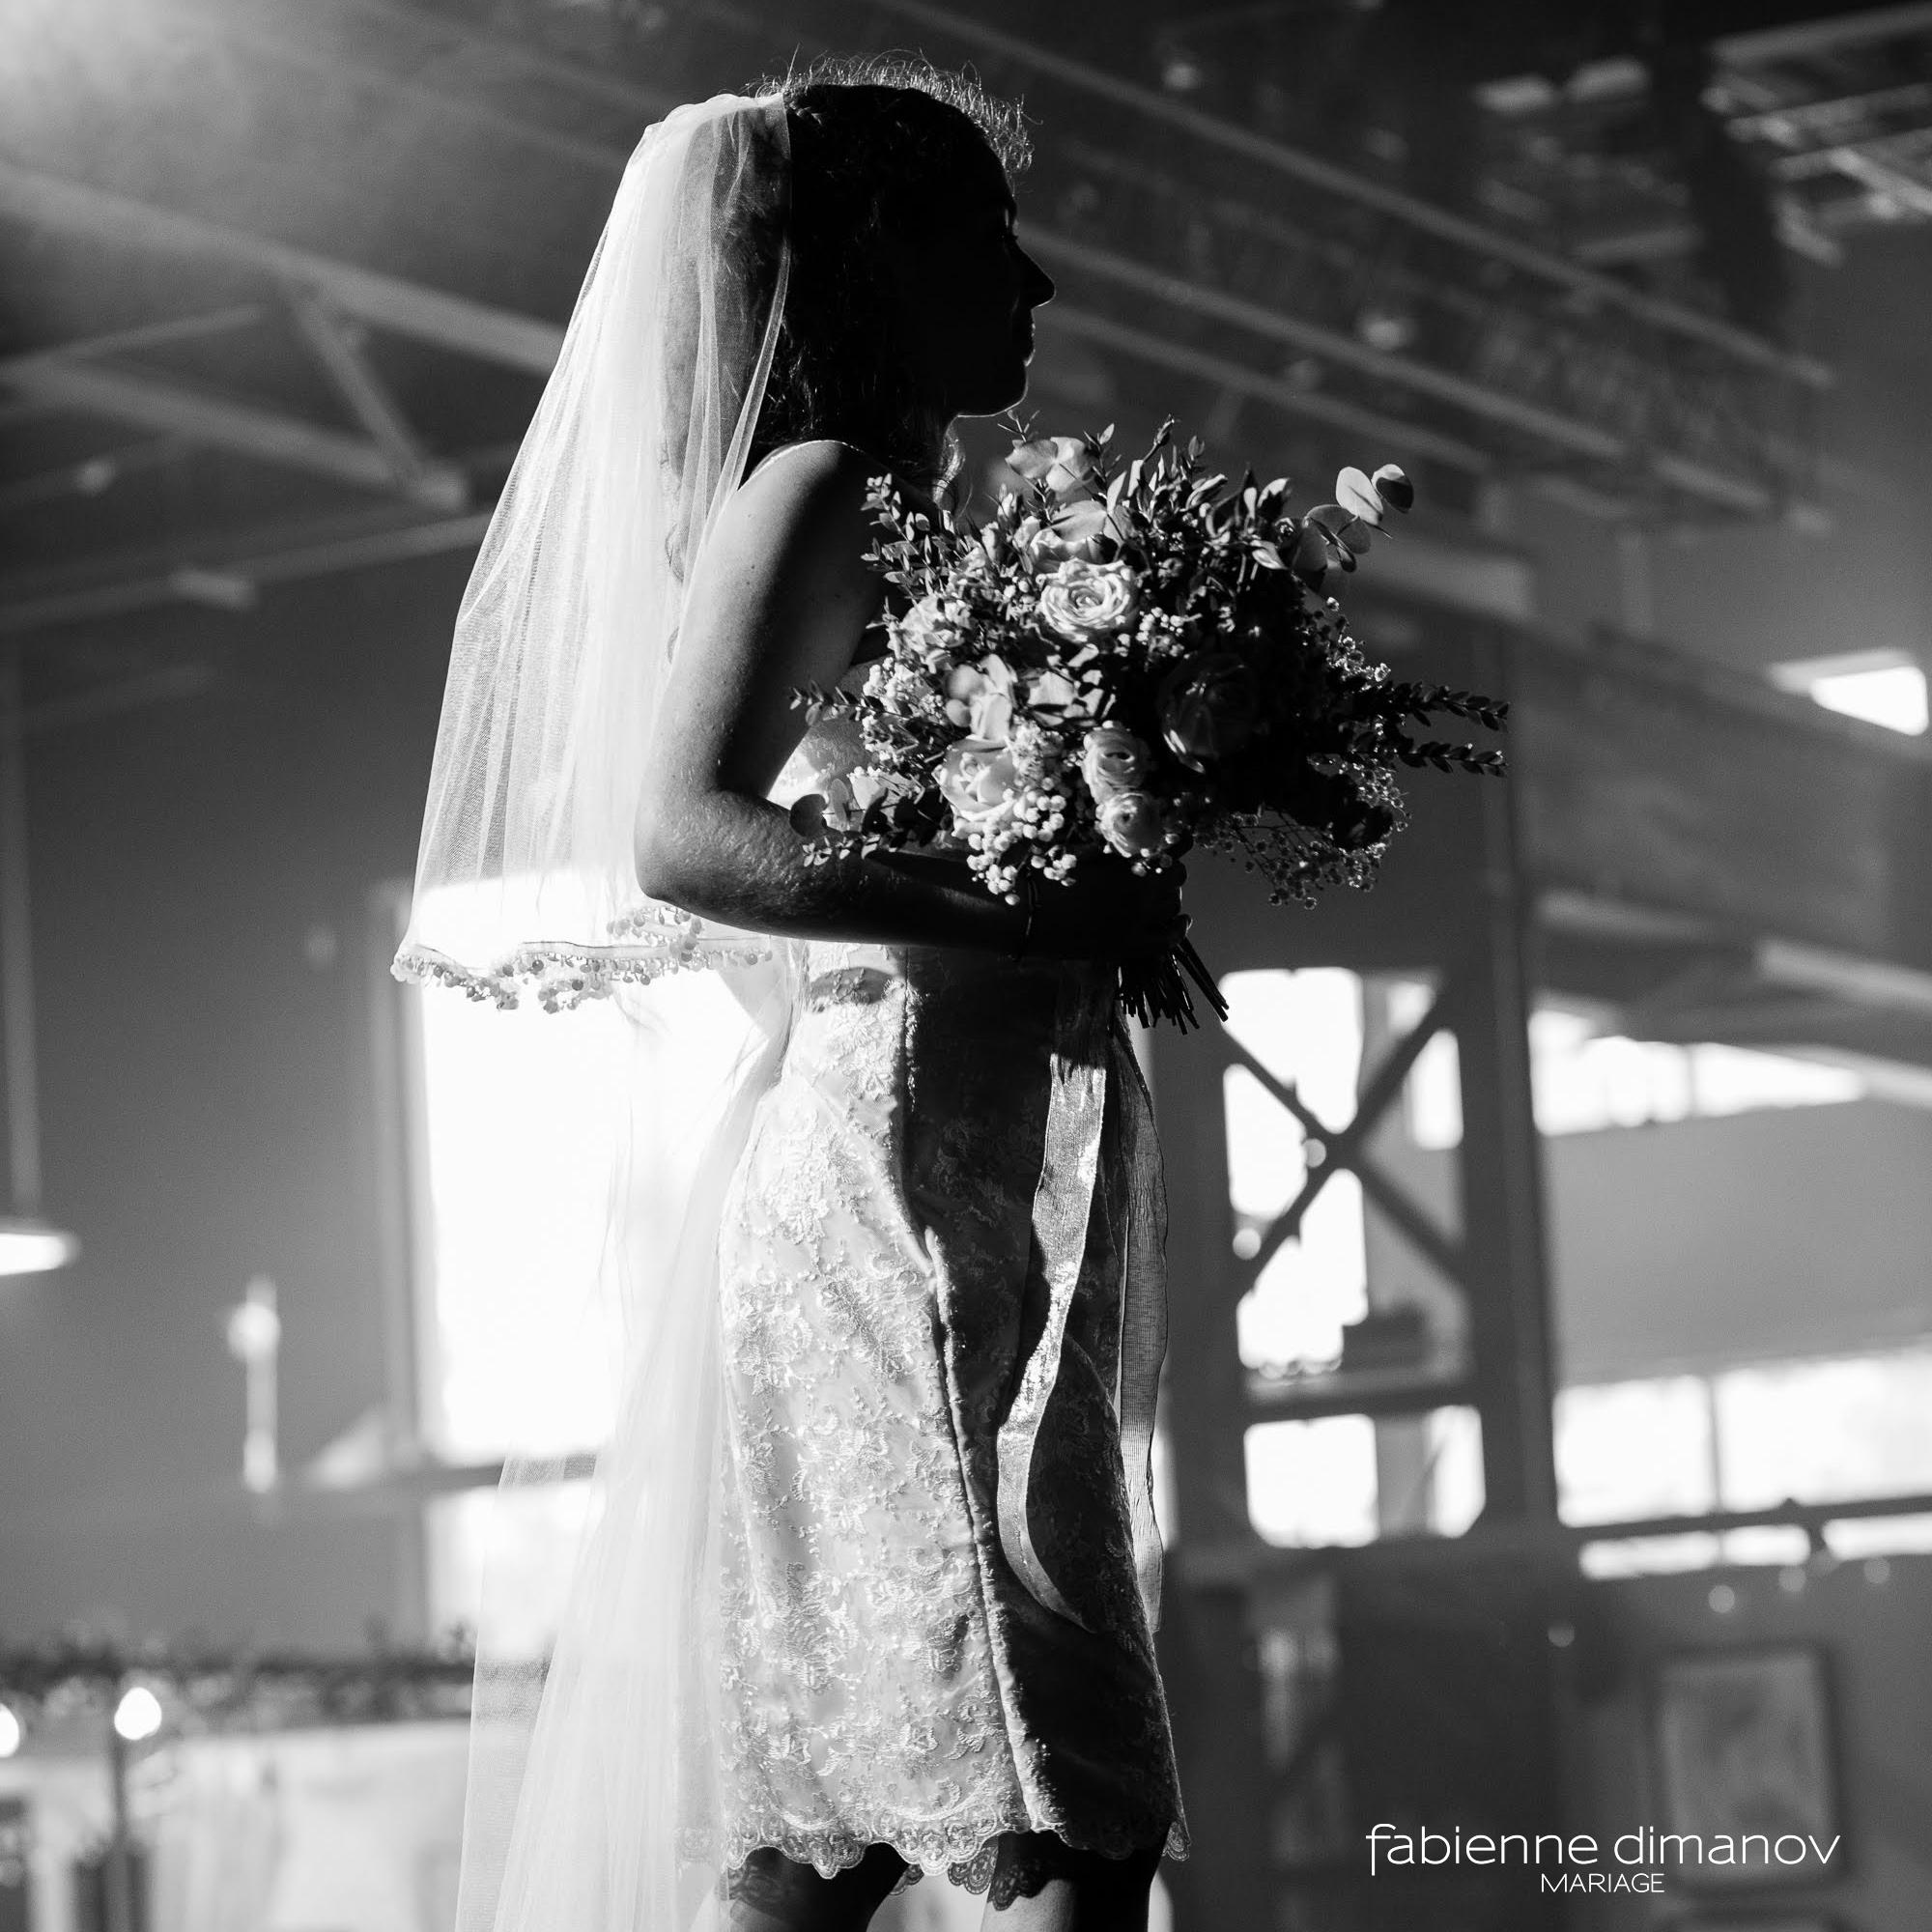 Mariée Rétro - Fabienne Dimanov mariage